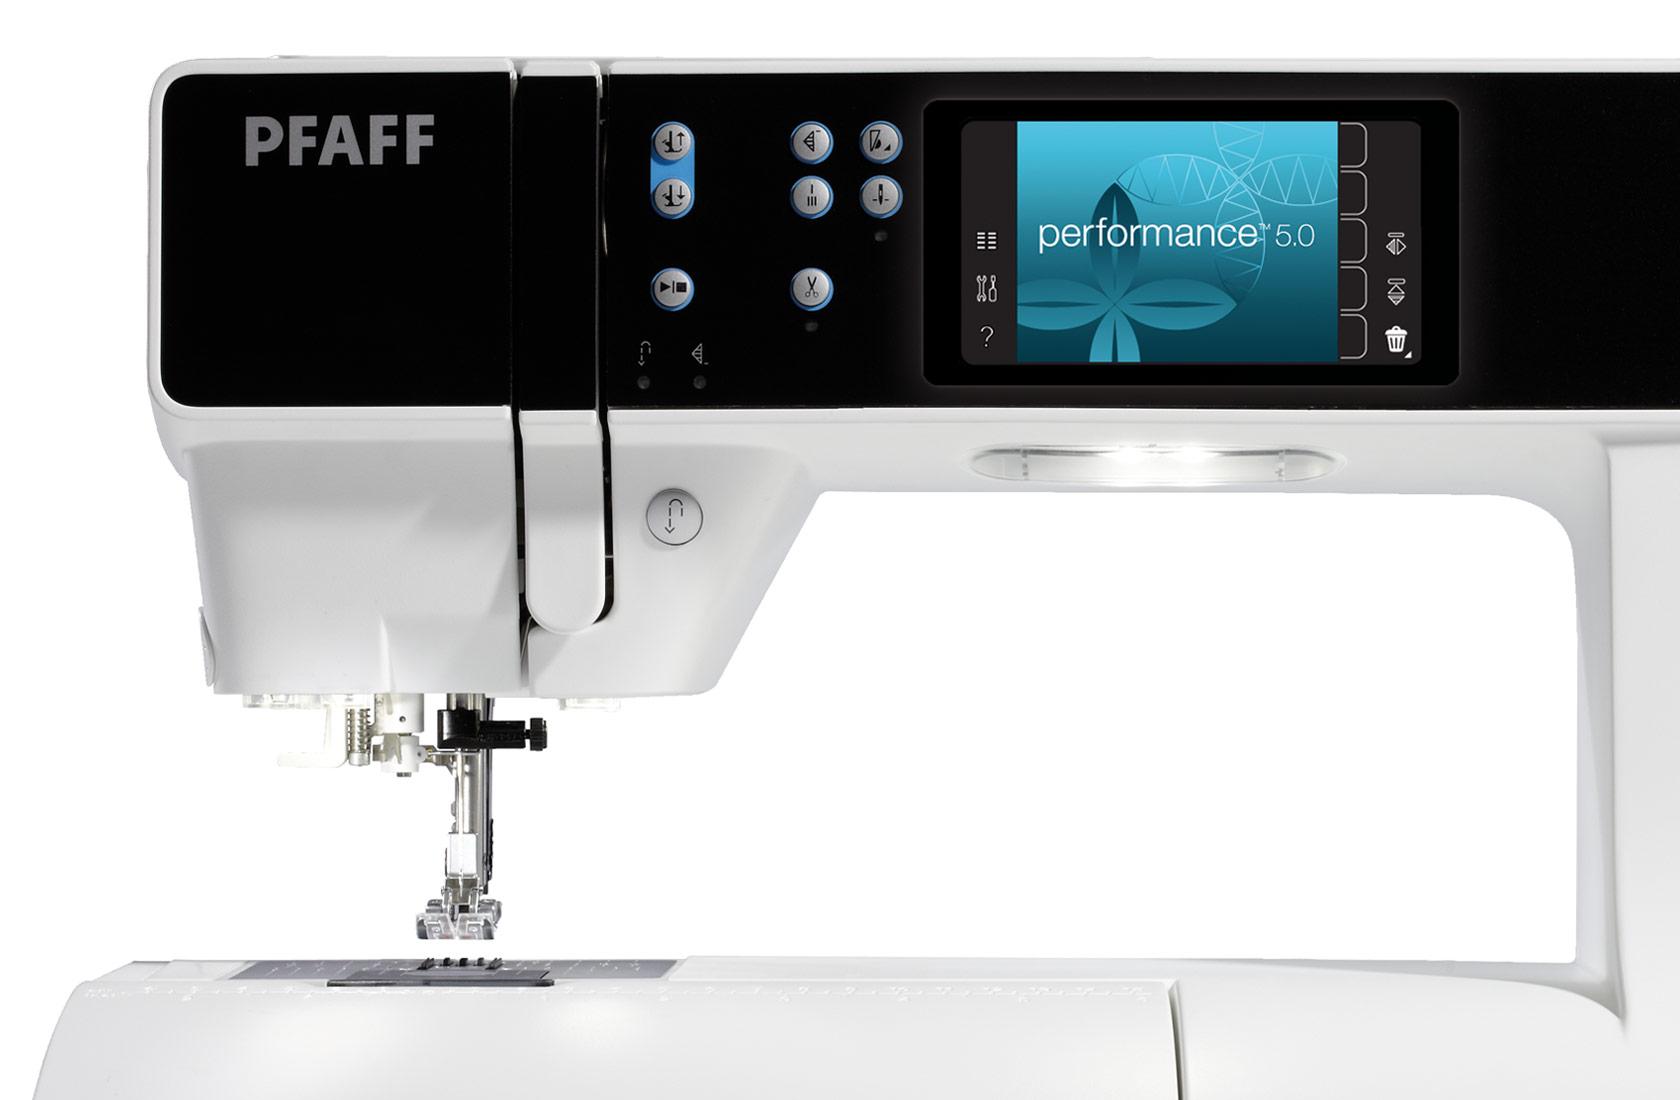 Pfaff performance 5 0 macchine per cucire elettroniche for Pfaff macchine per cucire